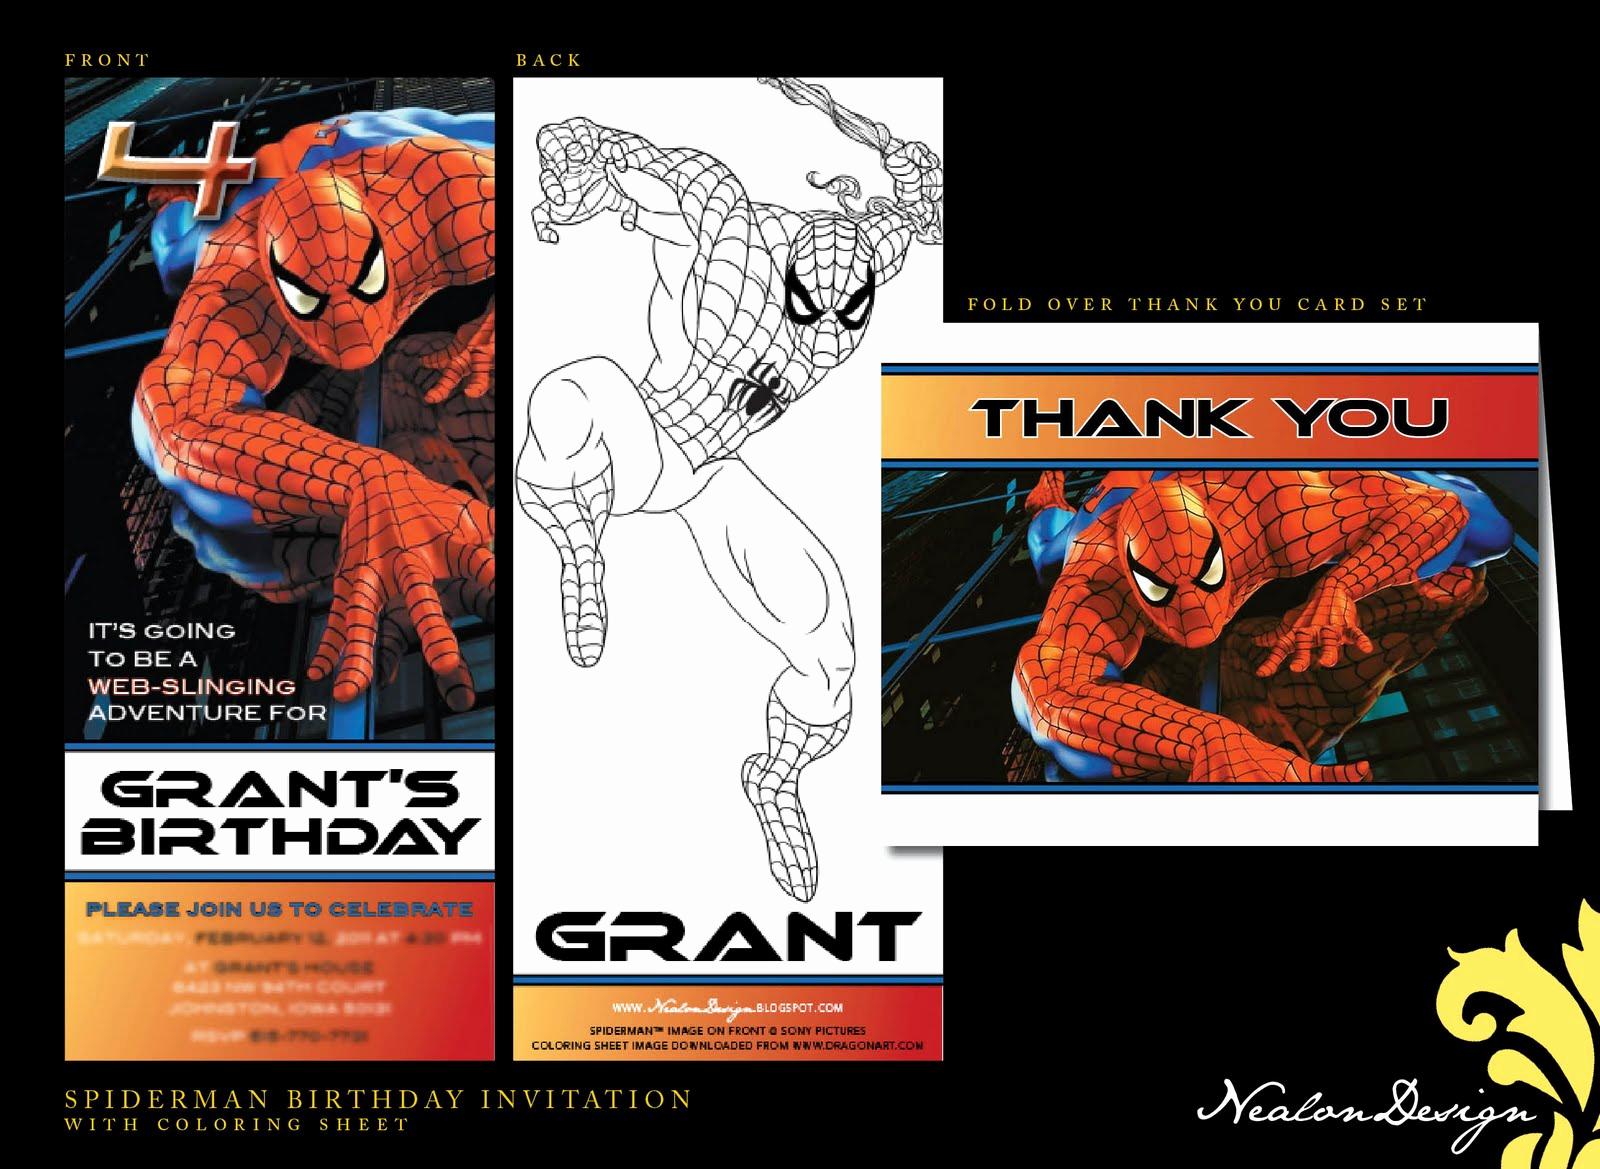 Spiderman Birthday Invitation Maker Inspirational Nealon Design Spiderman Birthday Invitation